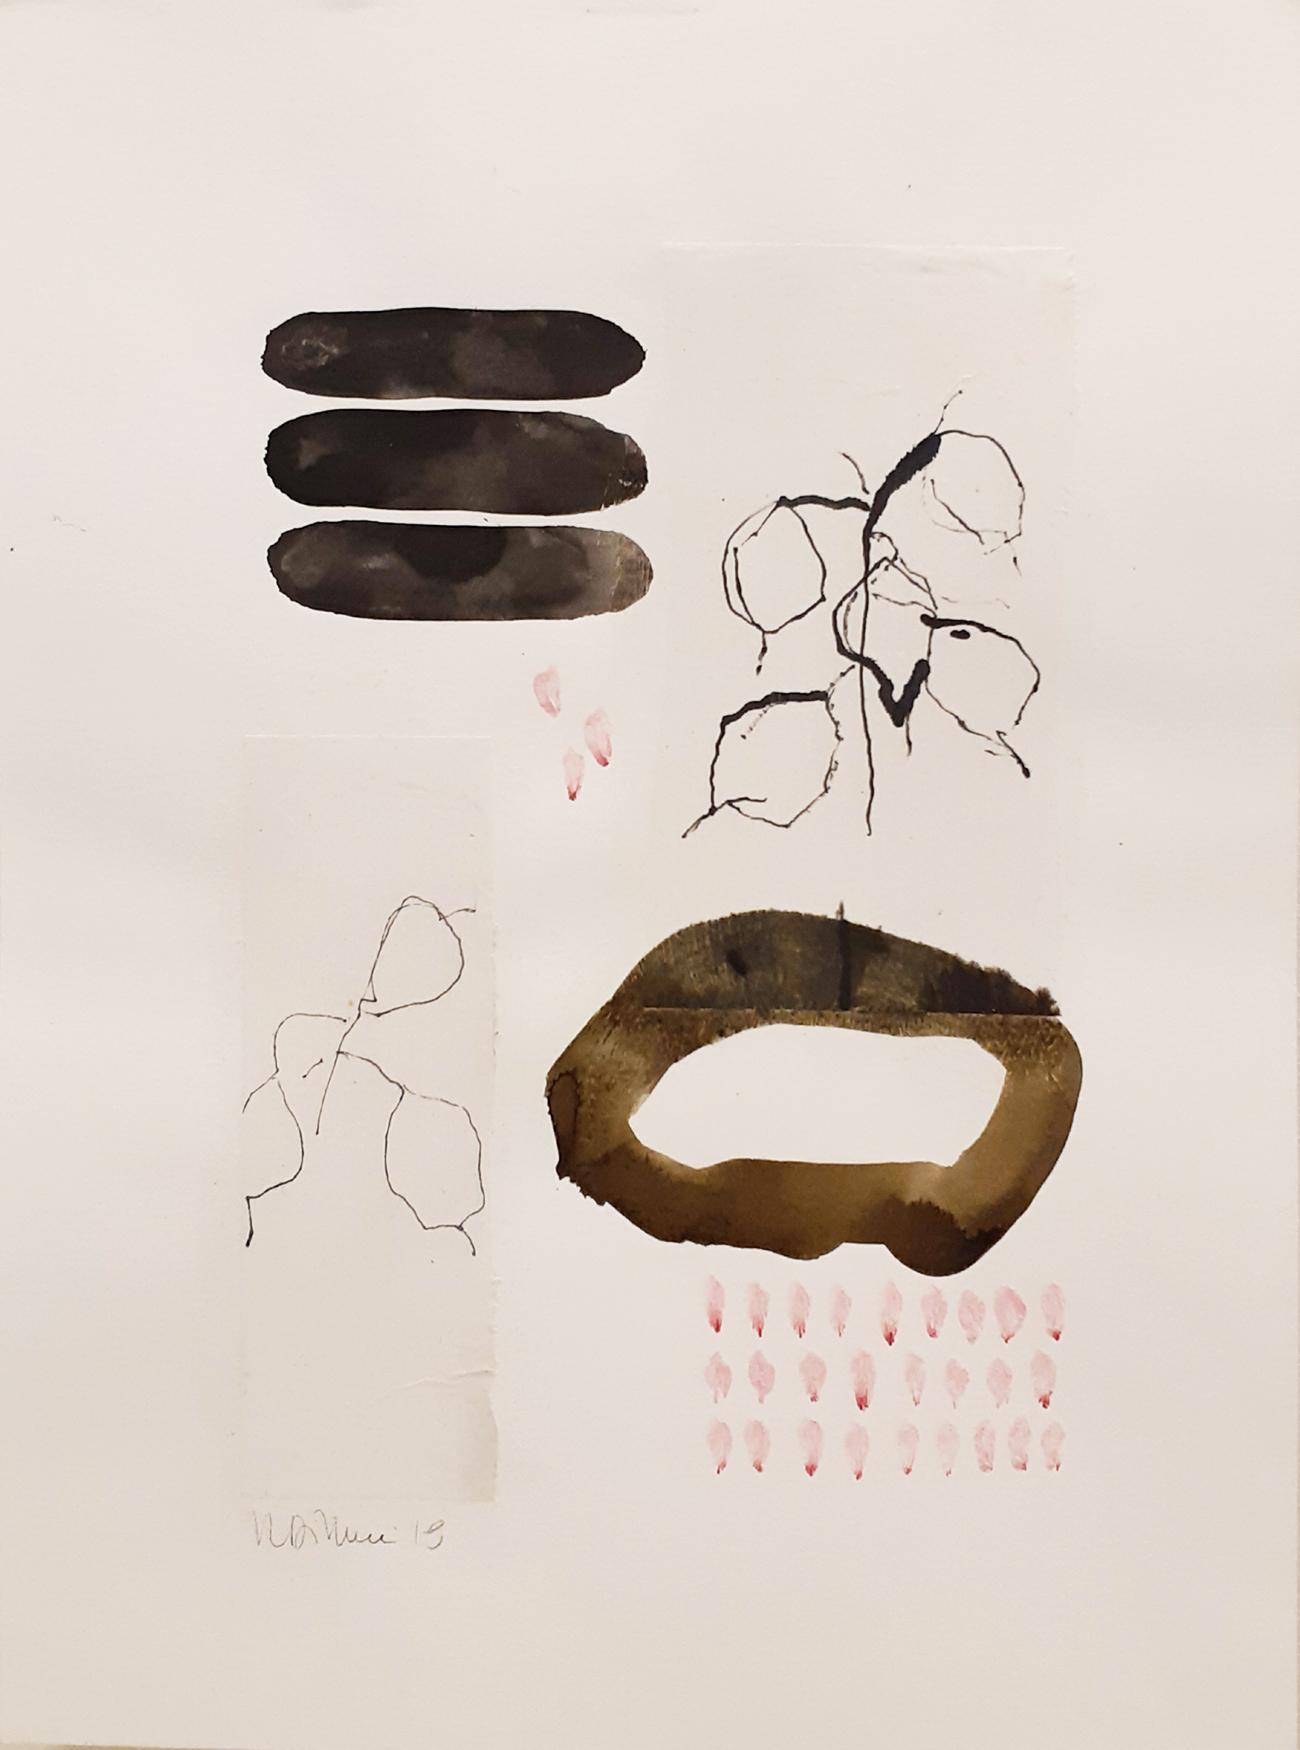 SOLD_Mixed media auf Papier / on paper  30 x 40 cm